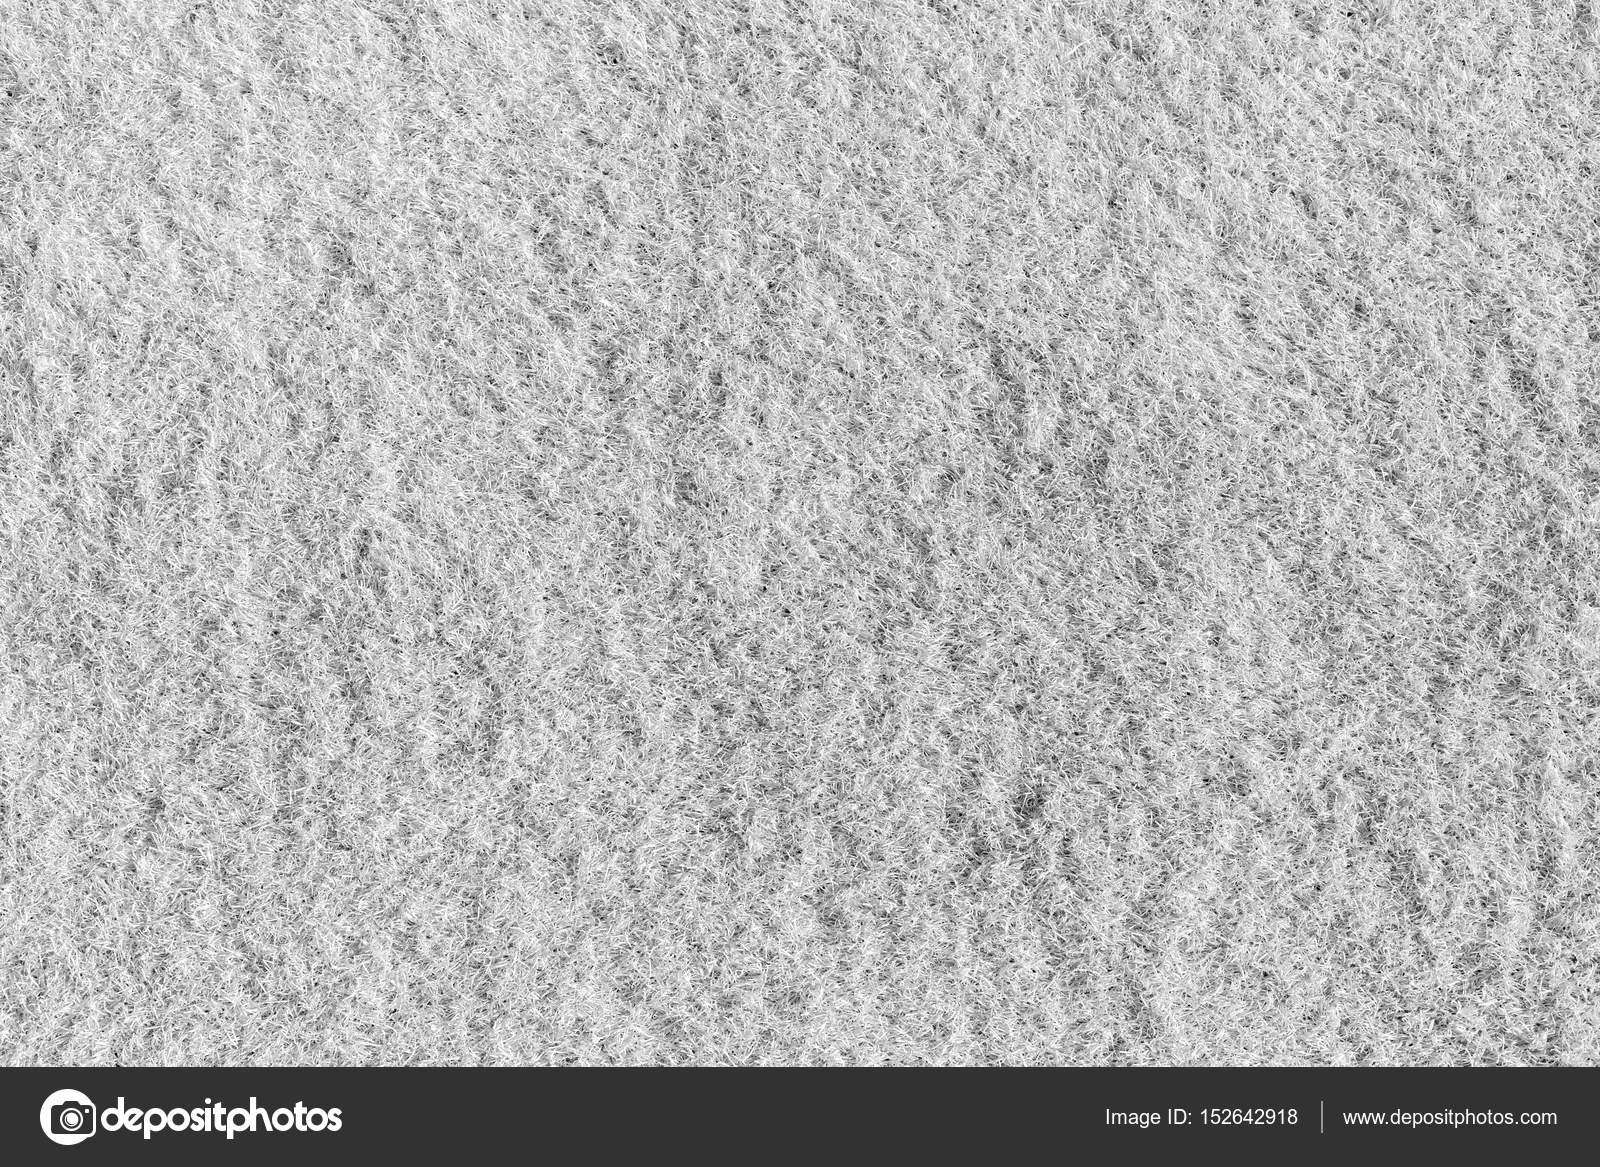 césped artificial blanco — Foto de stock © ballykdy #152642918